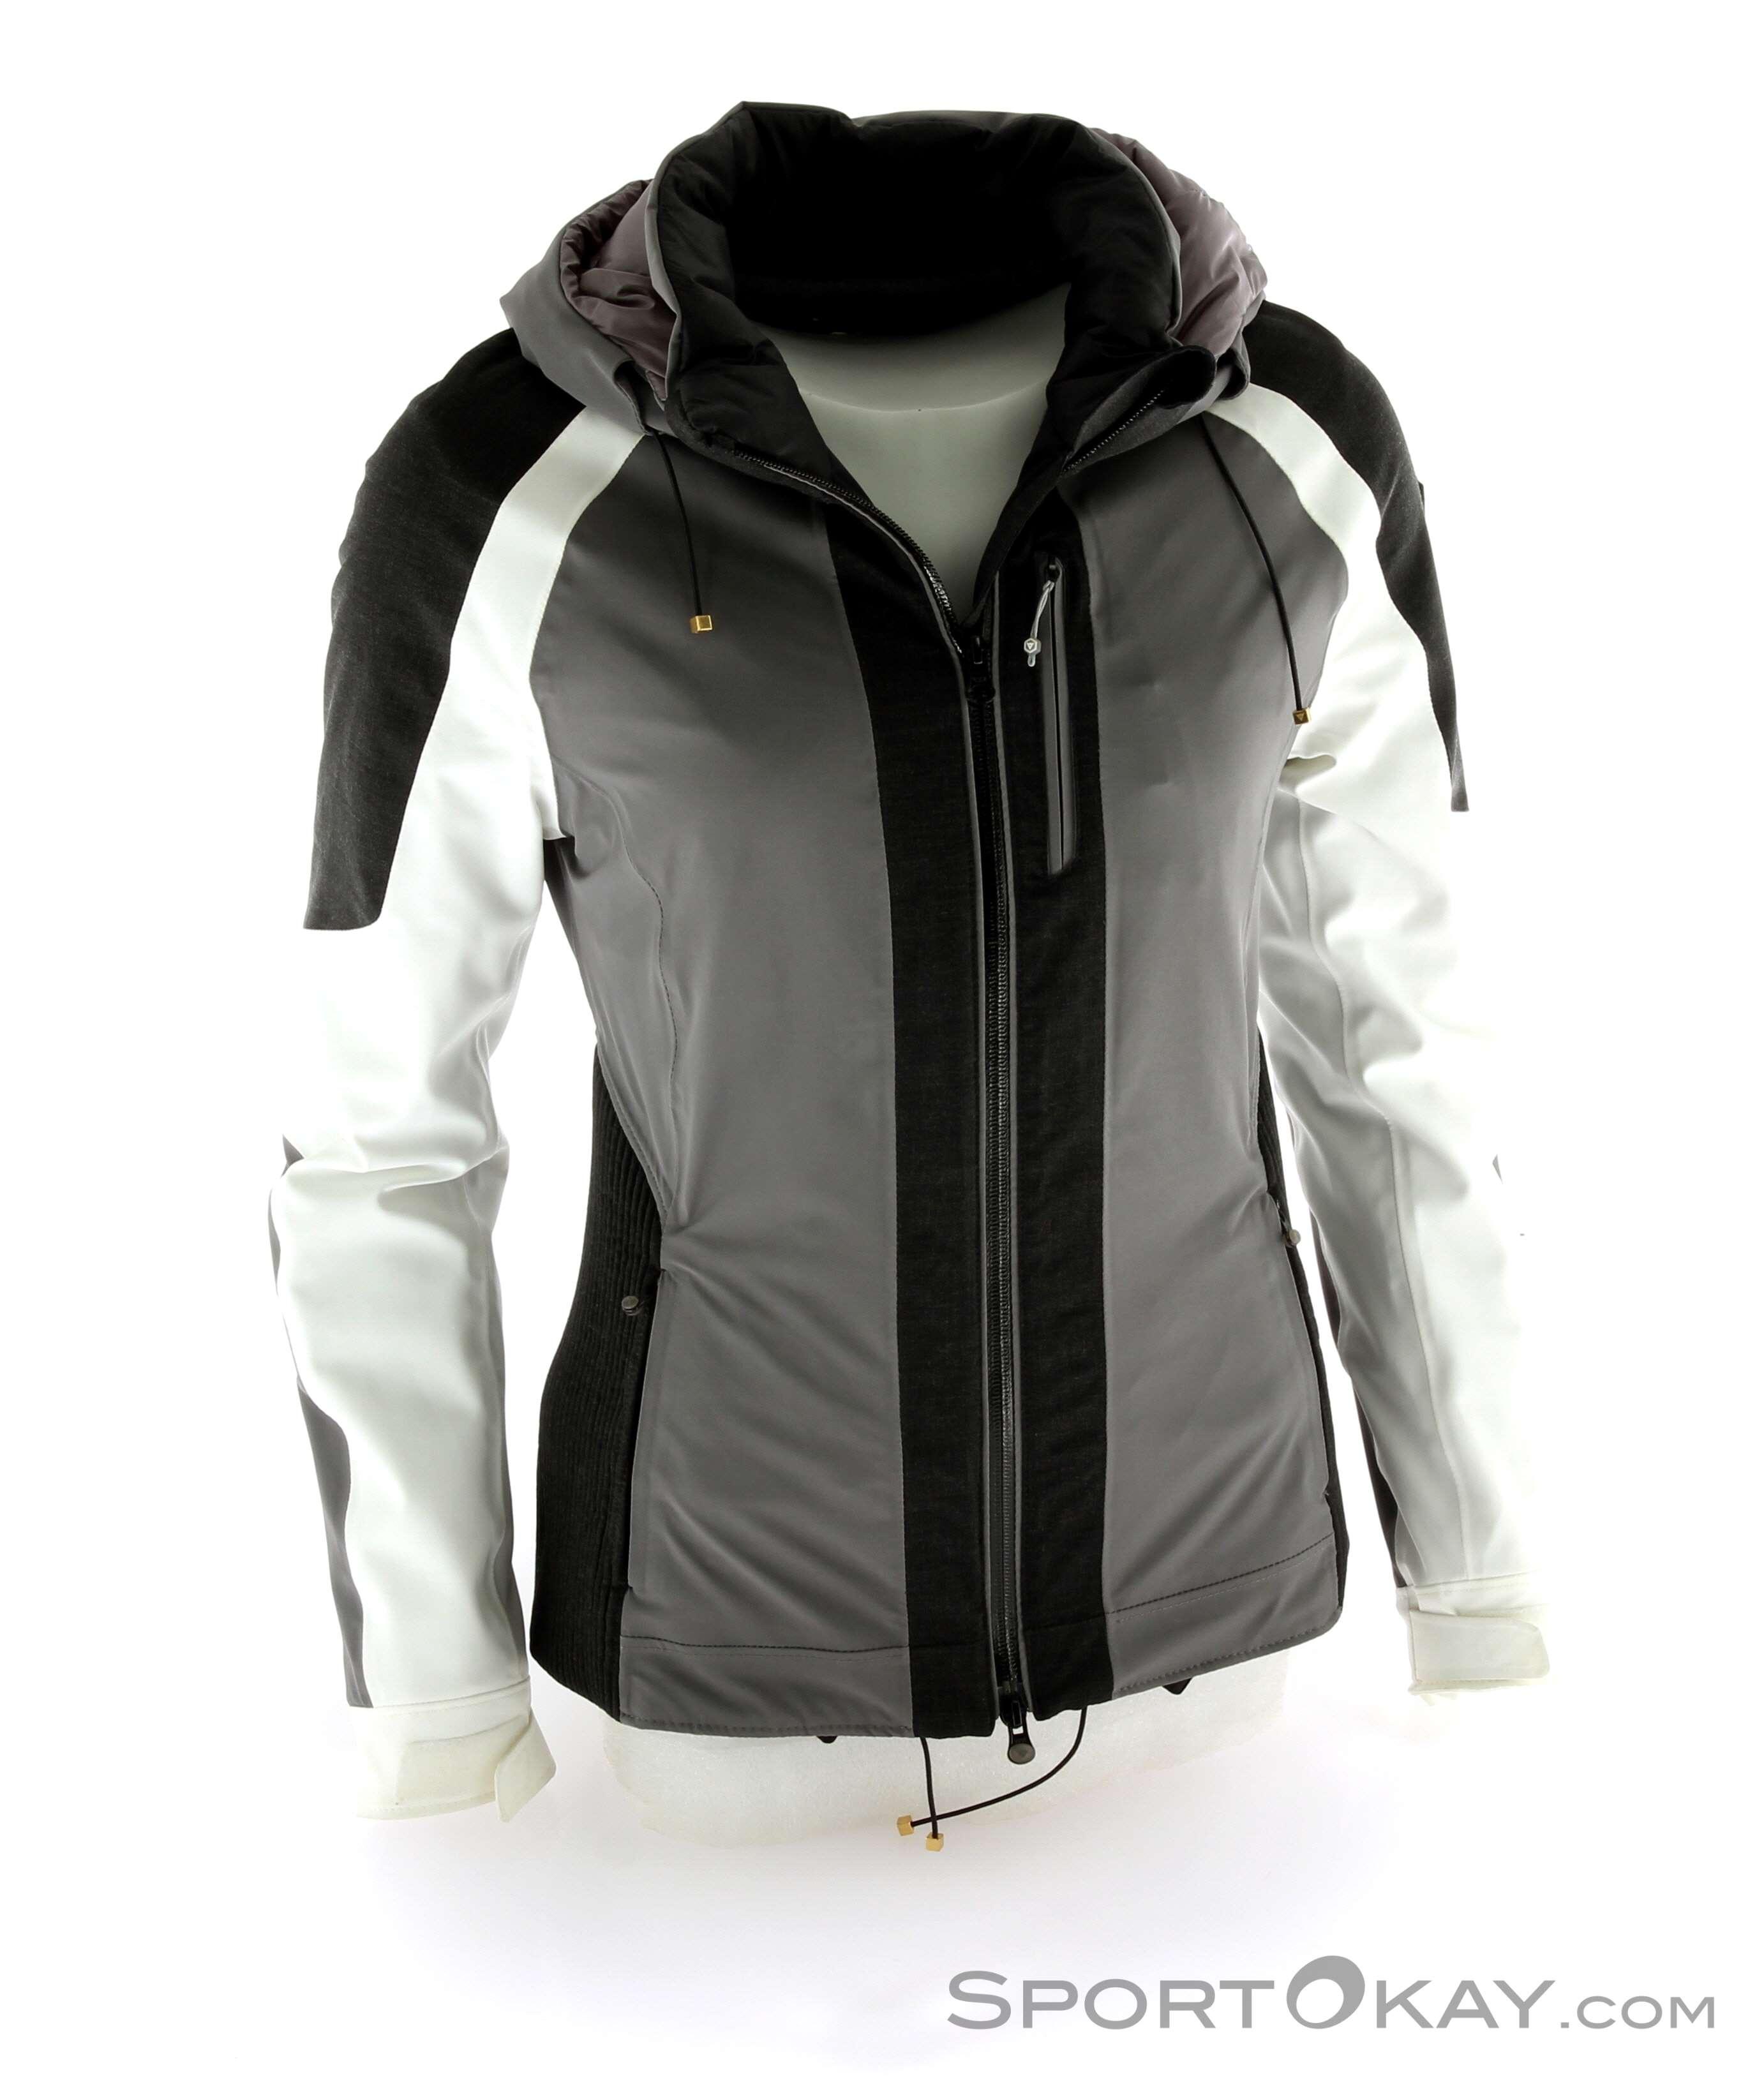 dainese febe d dry jacket womens ski jacket ski jackets. Black Bedroom Furniture Sets. Home Design Ideas